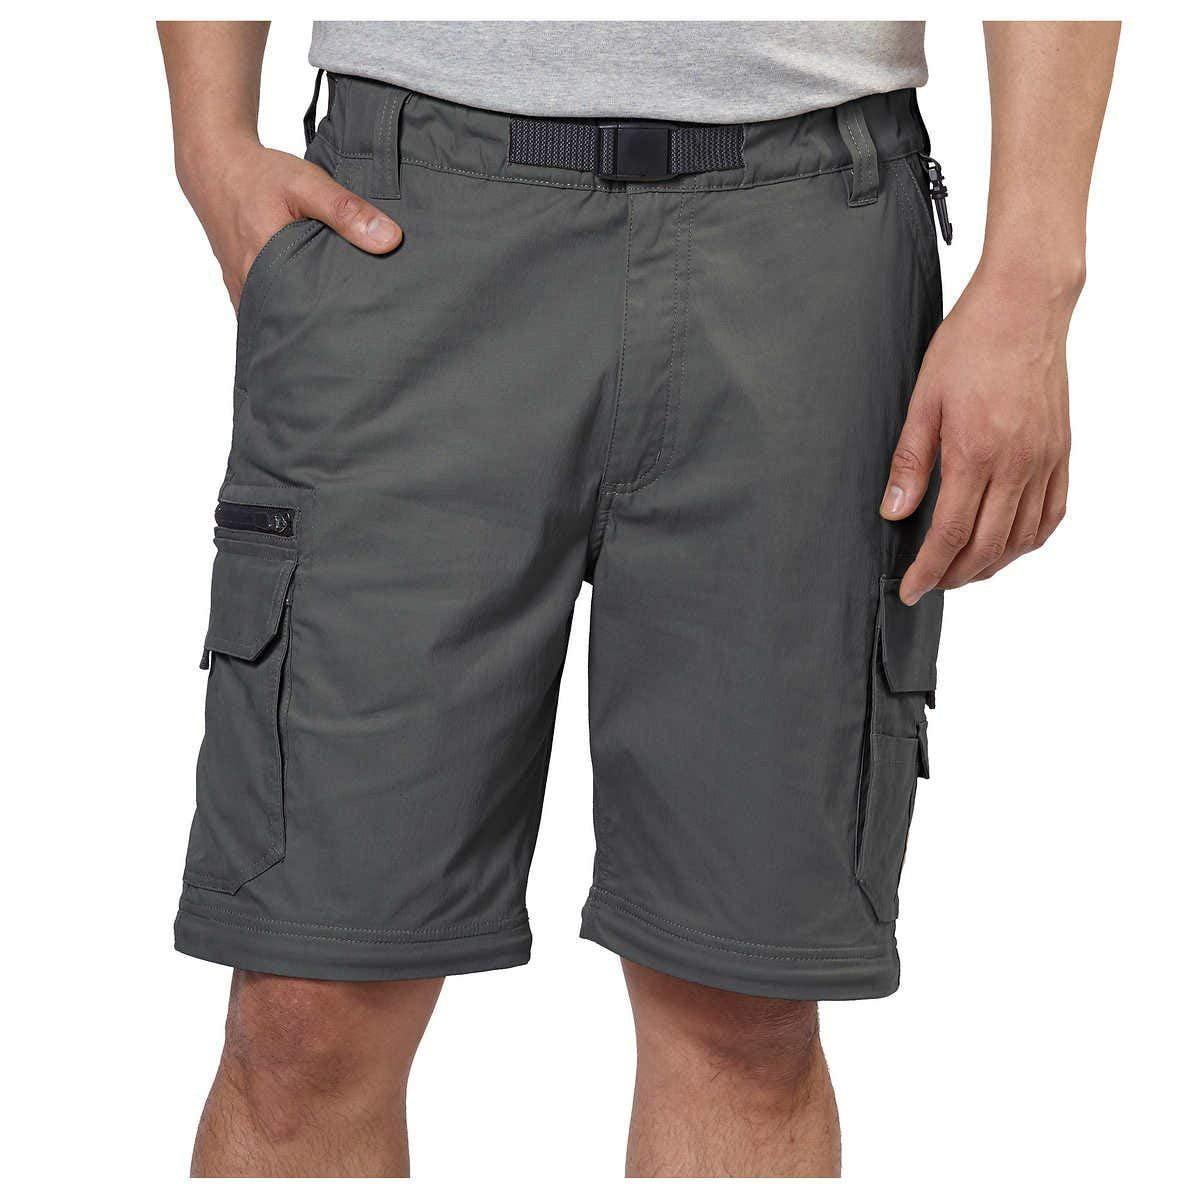 Zippered Pockets BC Clothing Mens Convertible Stretch Cargo Hiking Pants Shorts